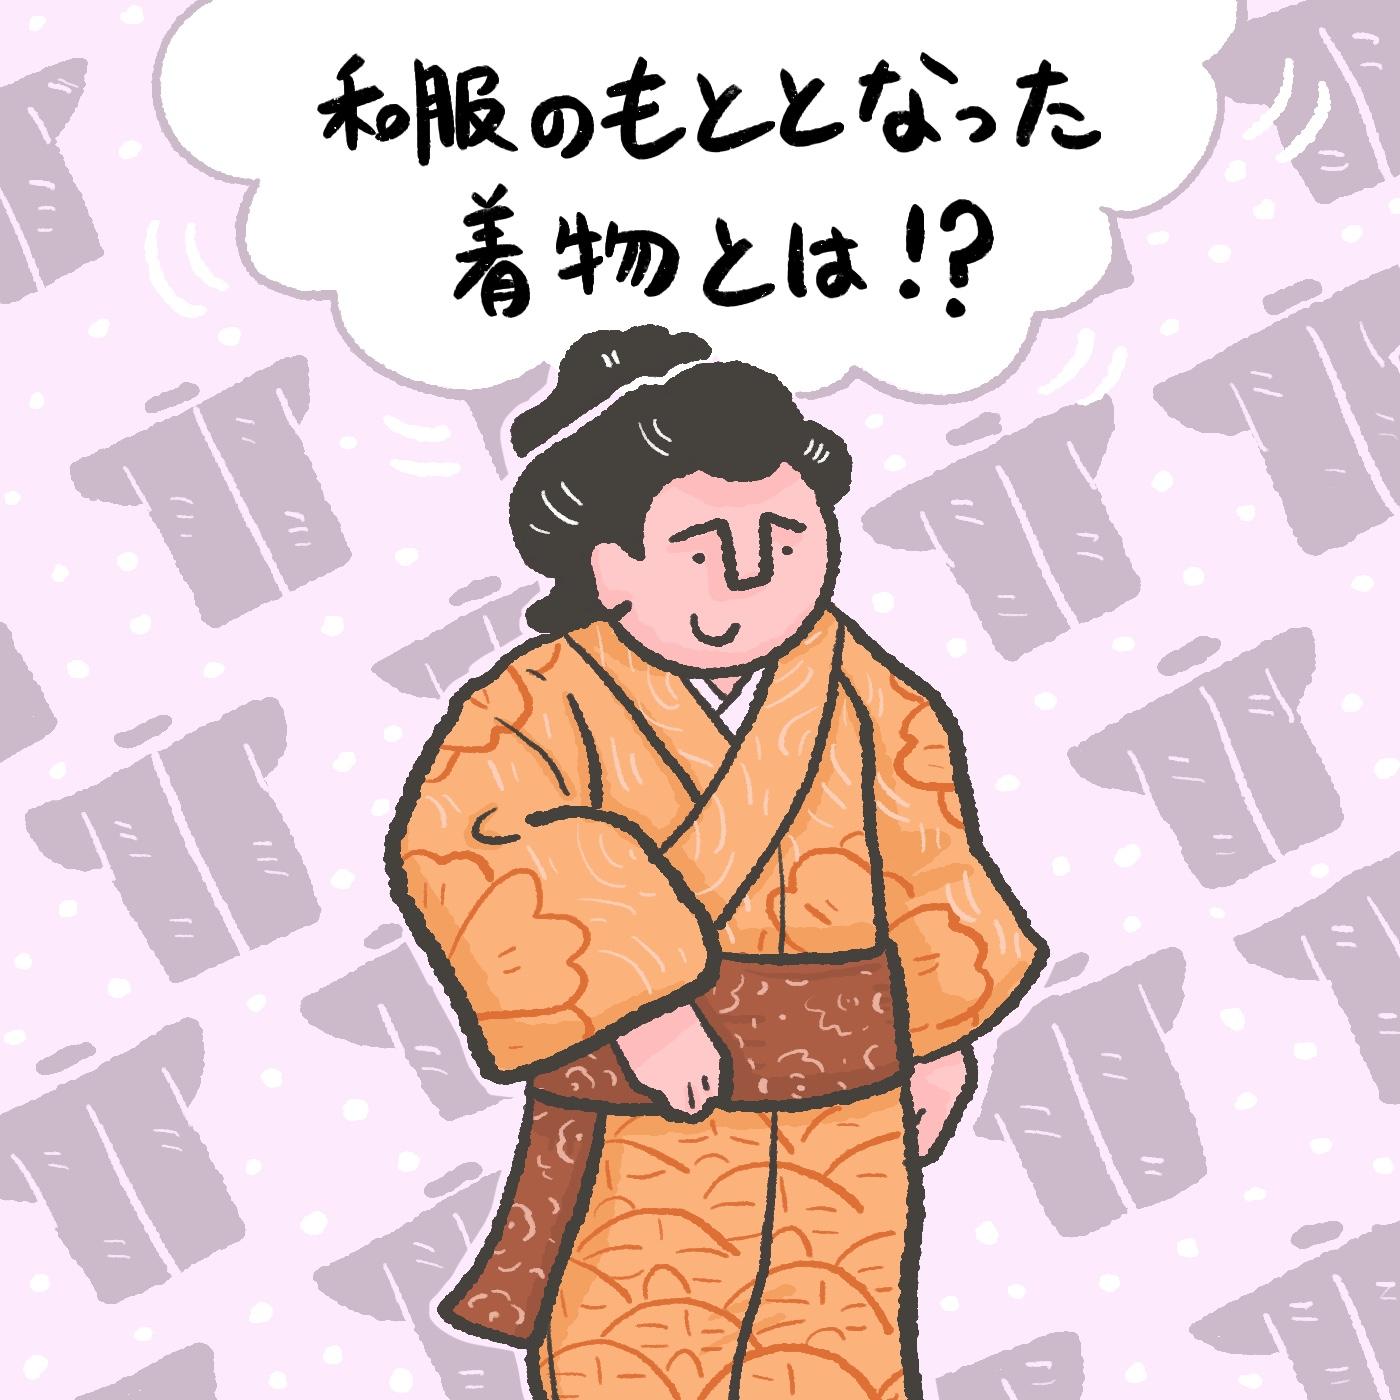 OBIKAKE ナニソレ 着物 和服 藤野遼太